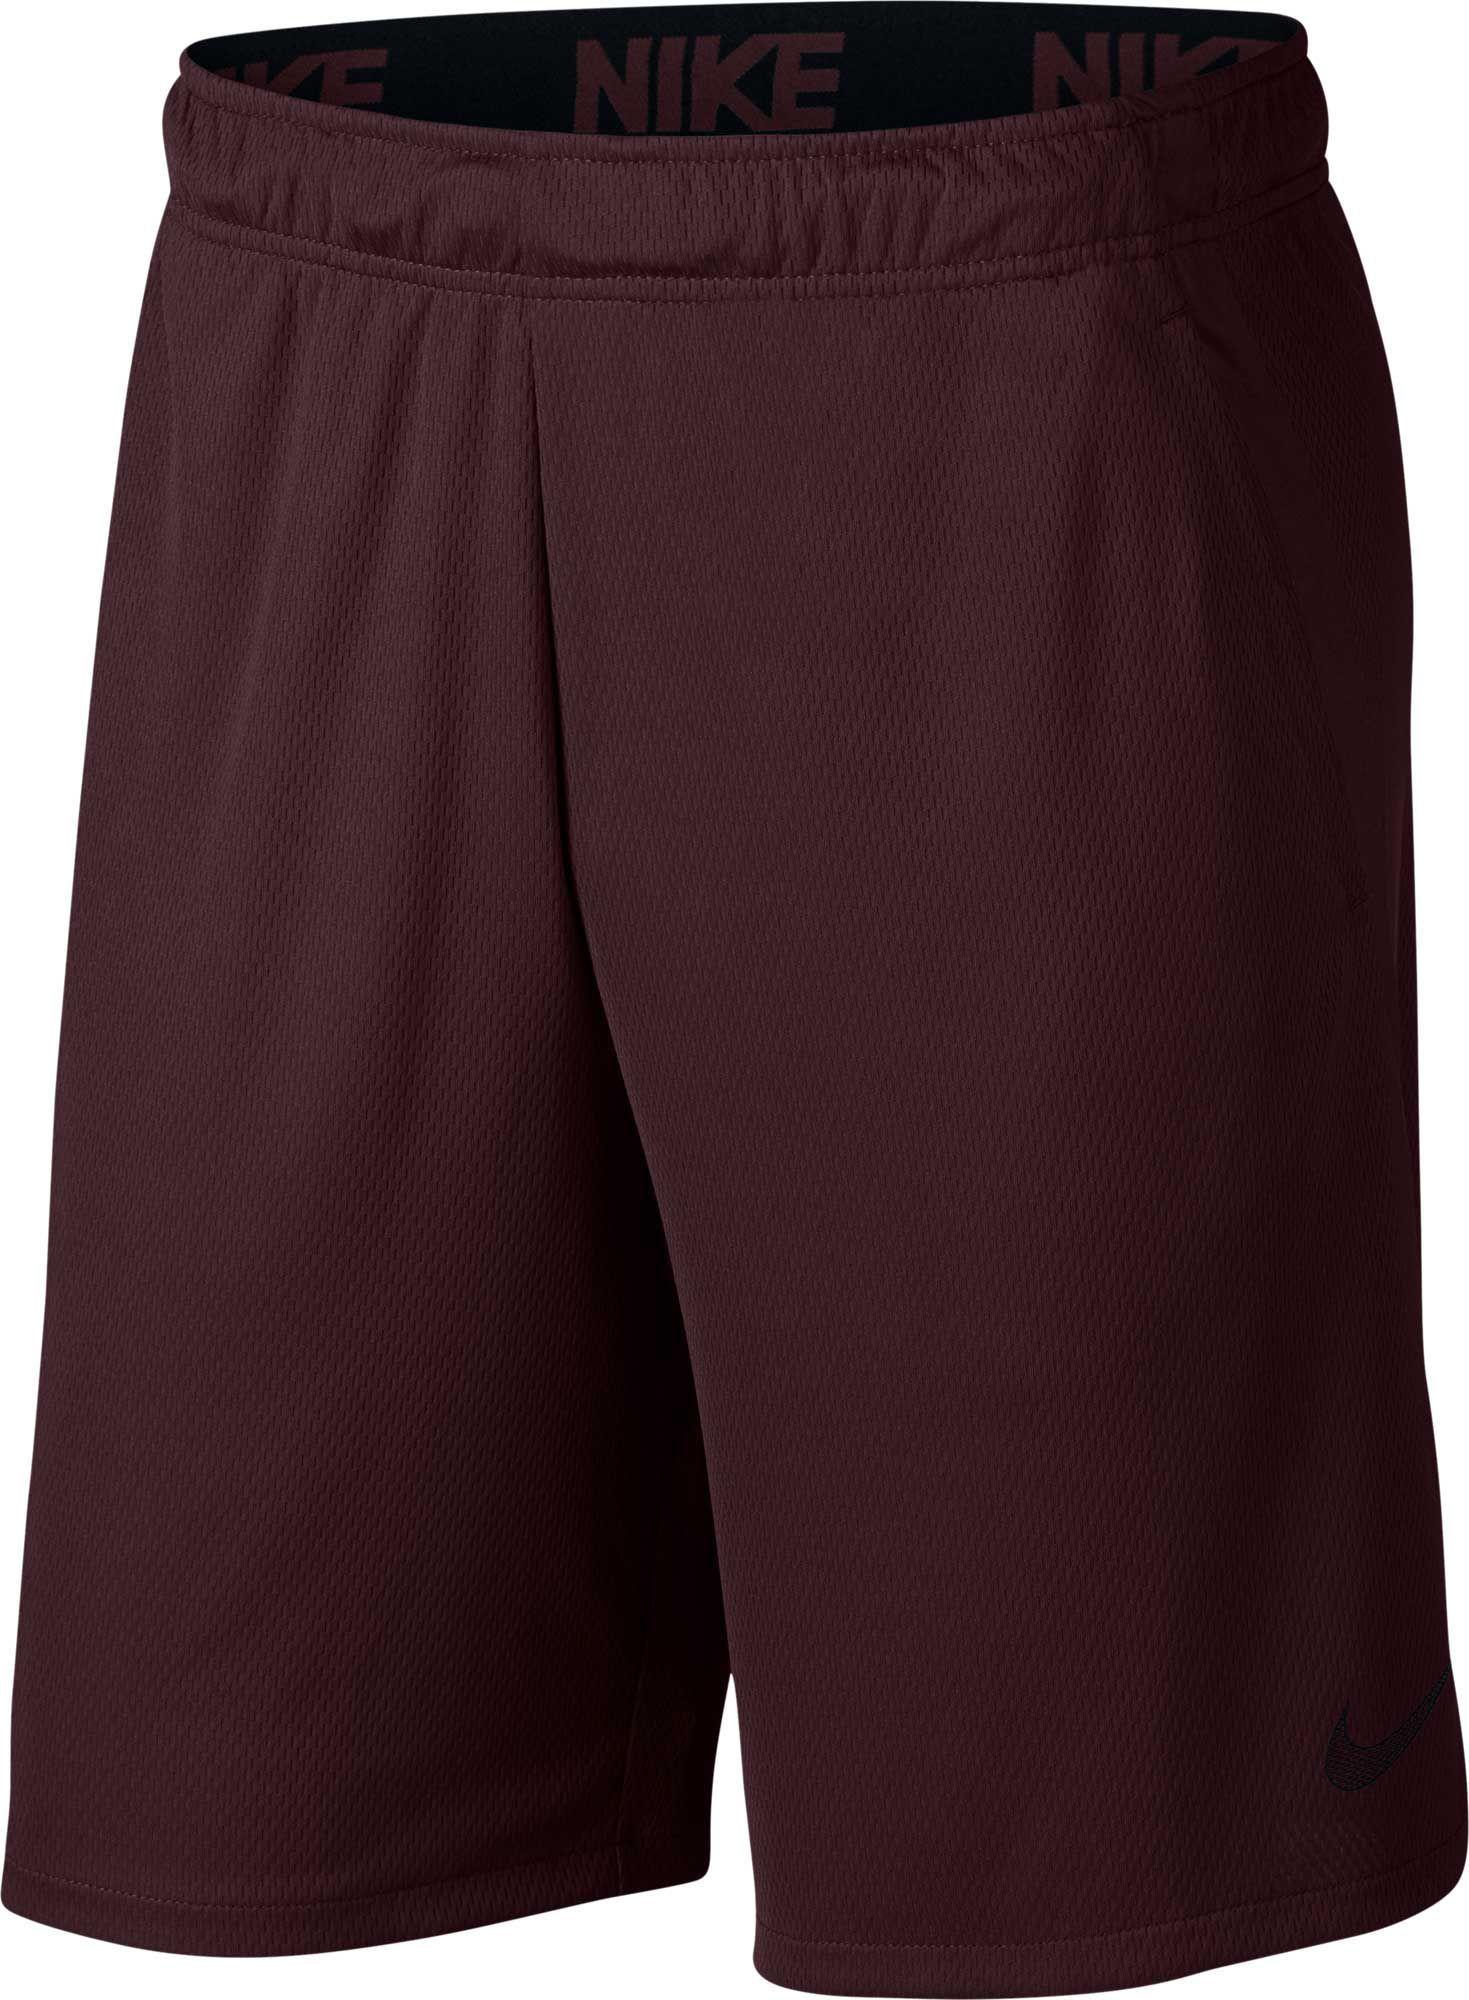 Nike Men's Dry 4.0 Training Shorts (Regular and Big & Tall